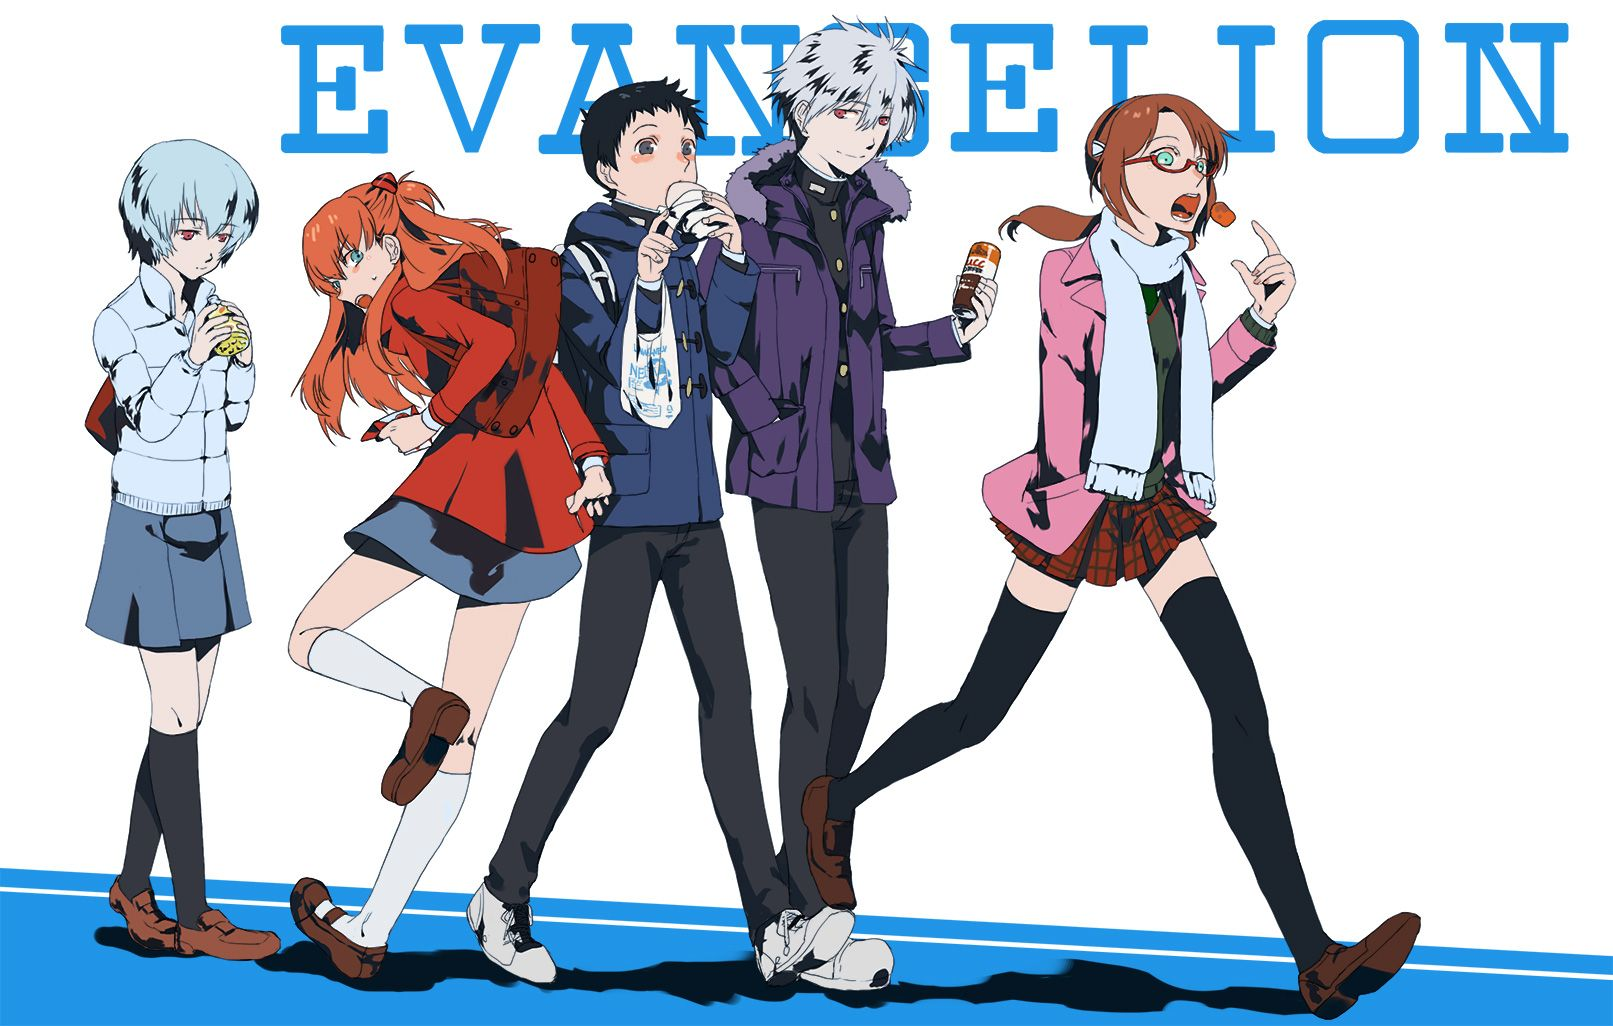 Tags Fanart Neon Genesis Evangelion Ayanami Rei Ikari Shinji Nagisa Kaworu Makinami Mari Illustrious Pixiv Souryuu Asuka La ¨ヴァ Ƕ¾æ³¢ Ɩ°ä¸–紀エヴァンゲリオン ¢スカラングレー